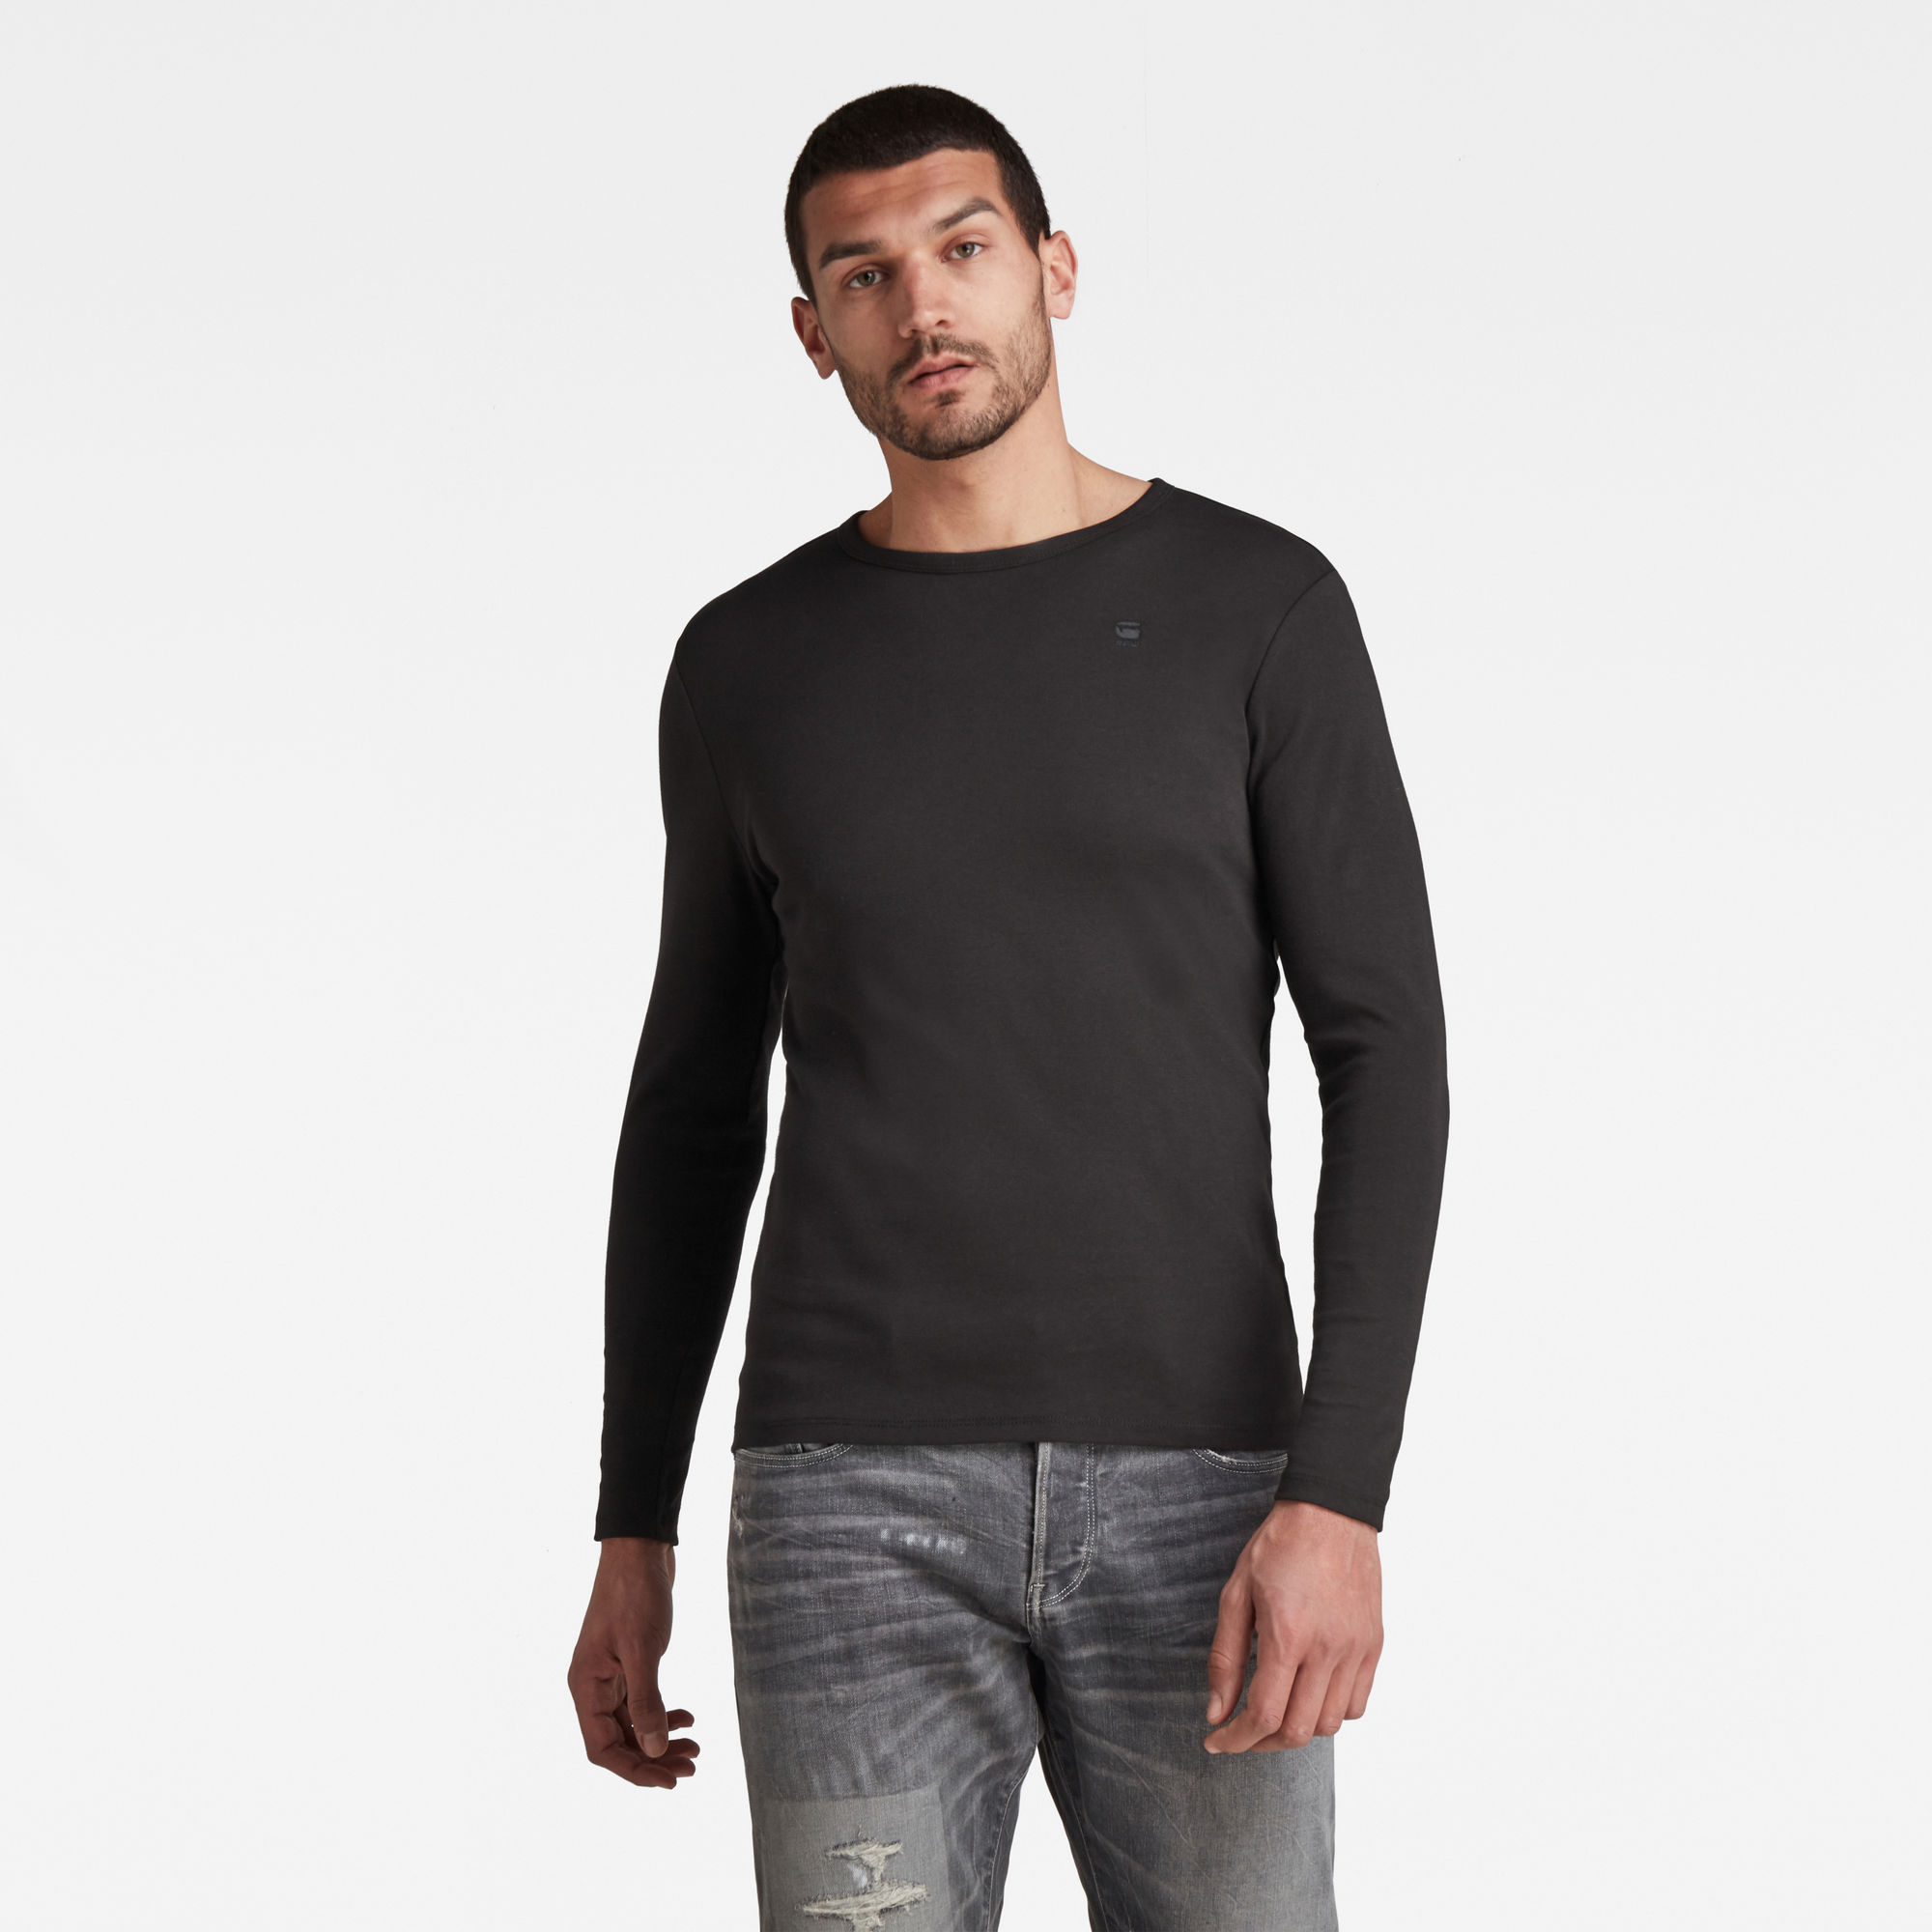 Van G Star Raw Basic Round Neck Long Sleeve T-Shirt Prijsvergelijk nu!